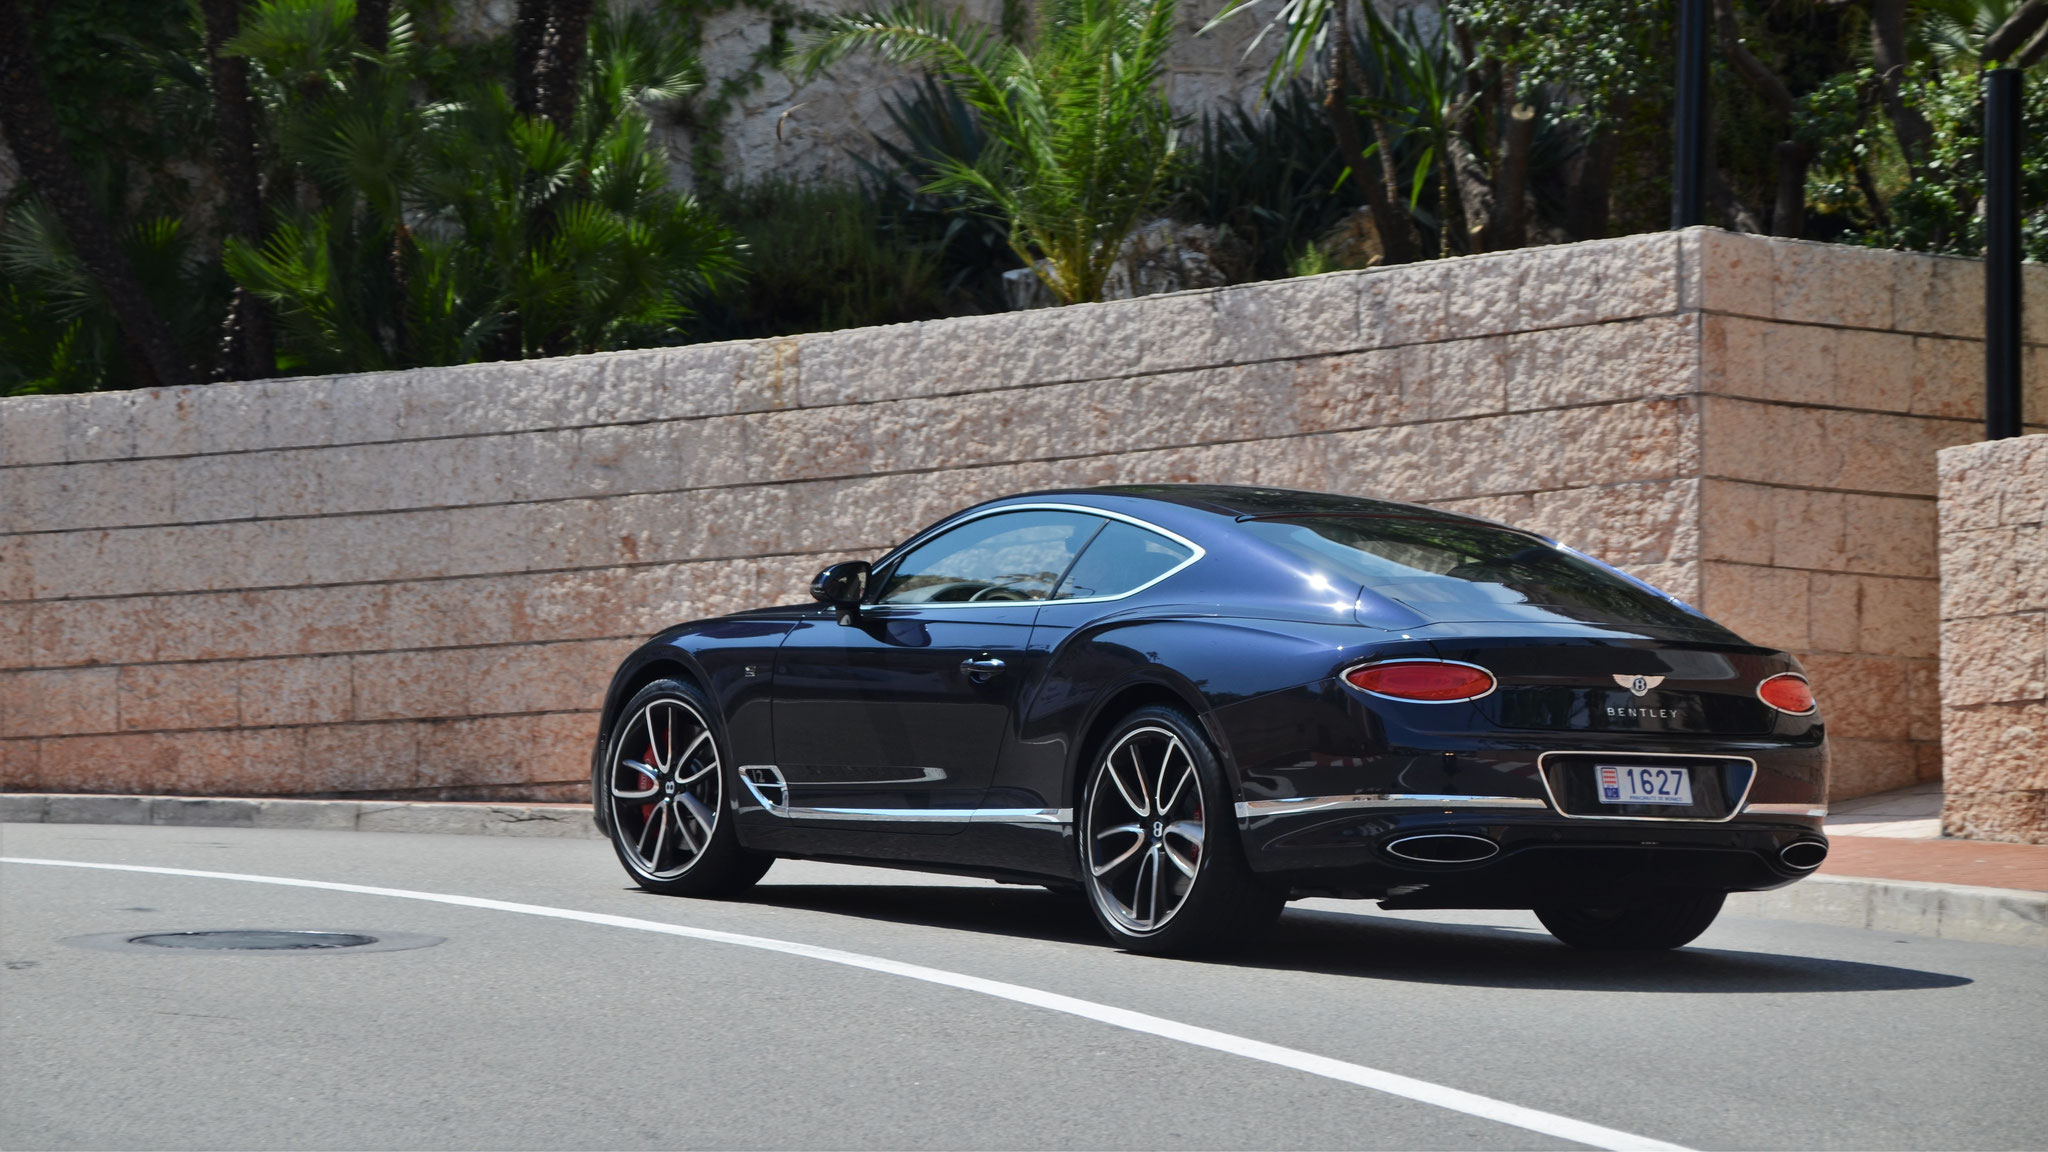 Bentley Continental GT - 1627 (MC)